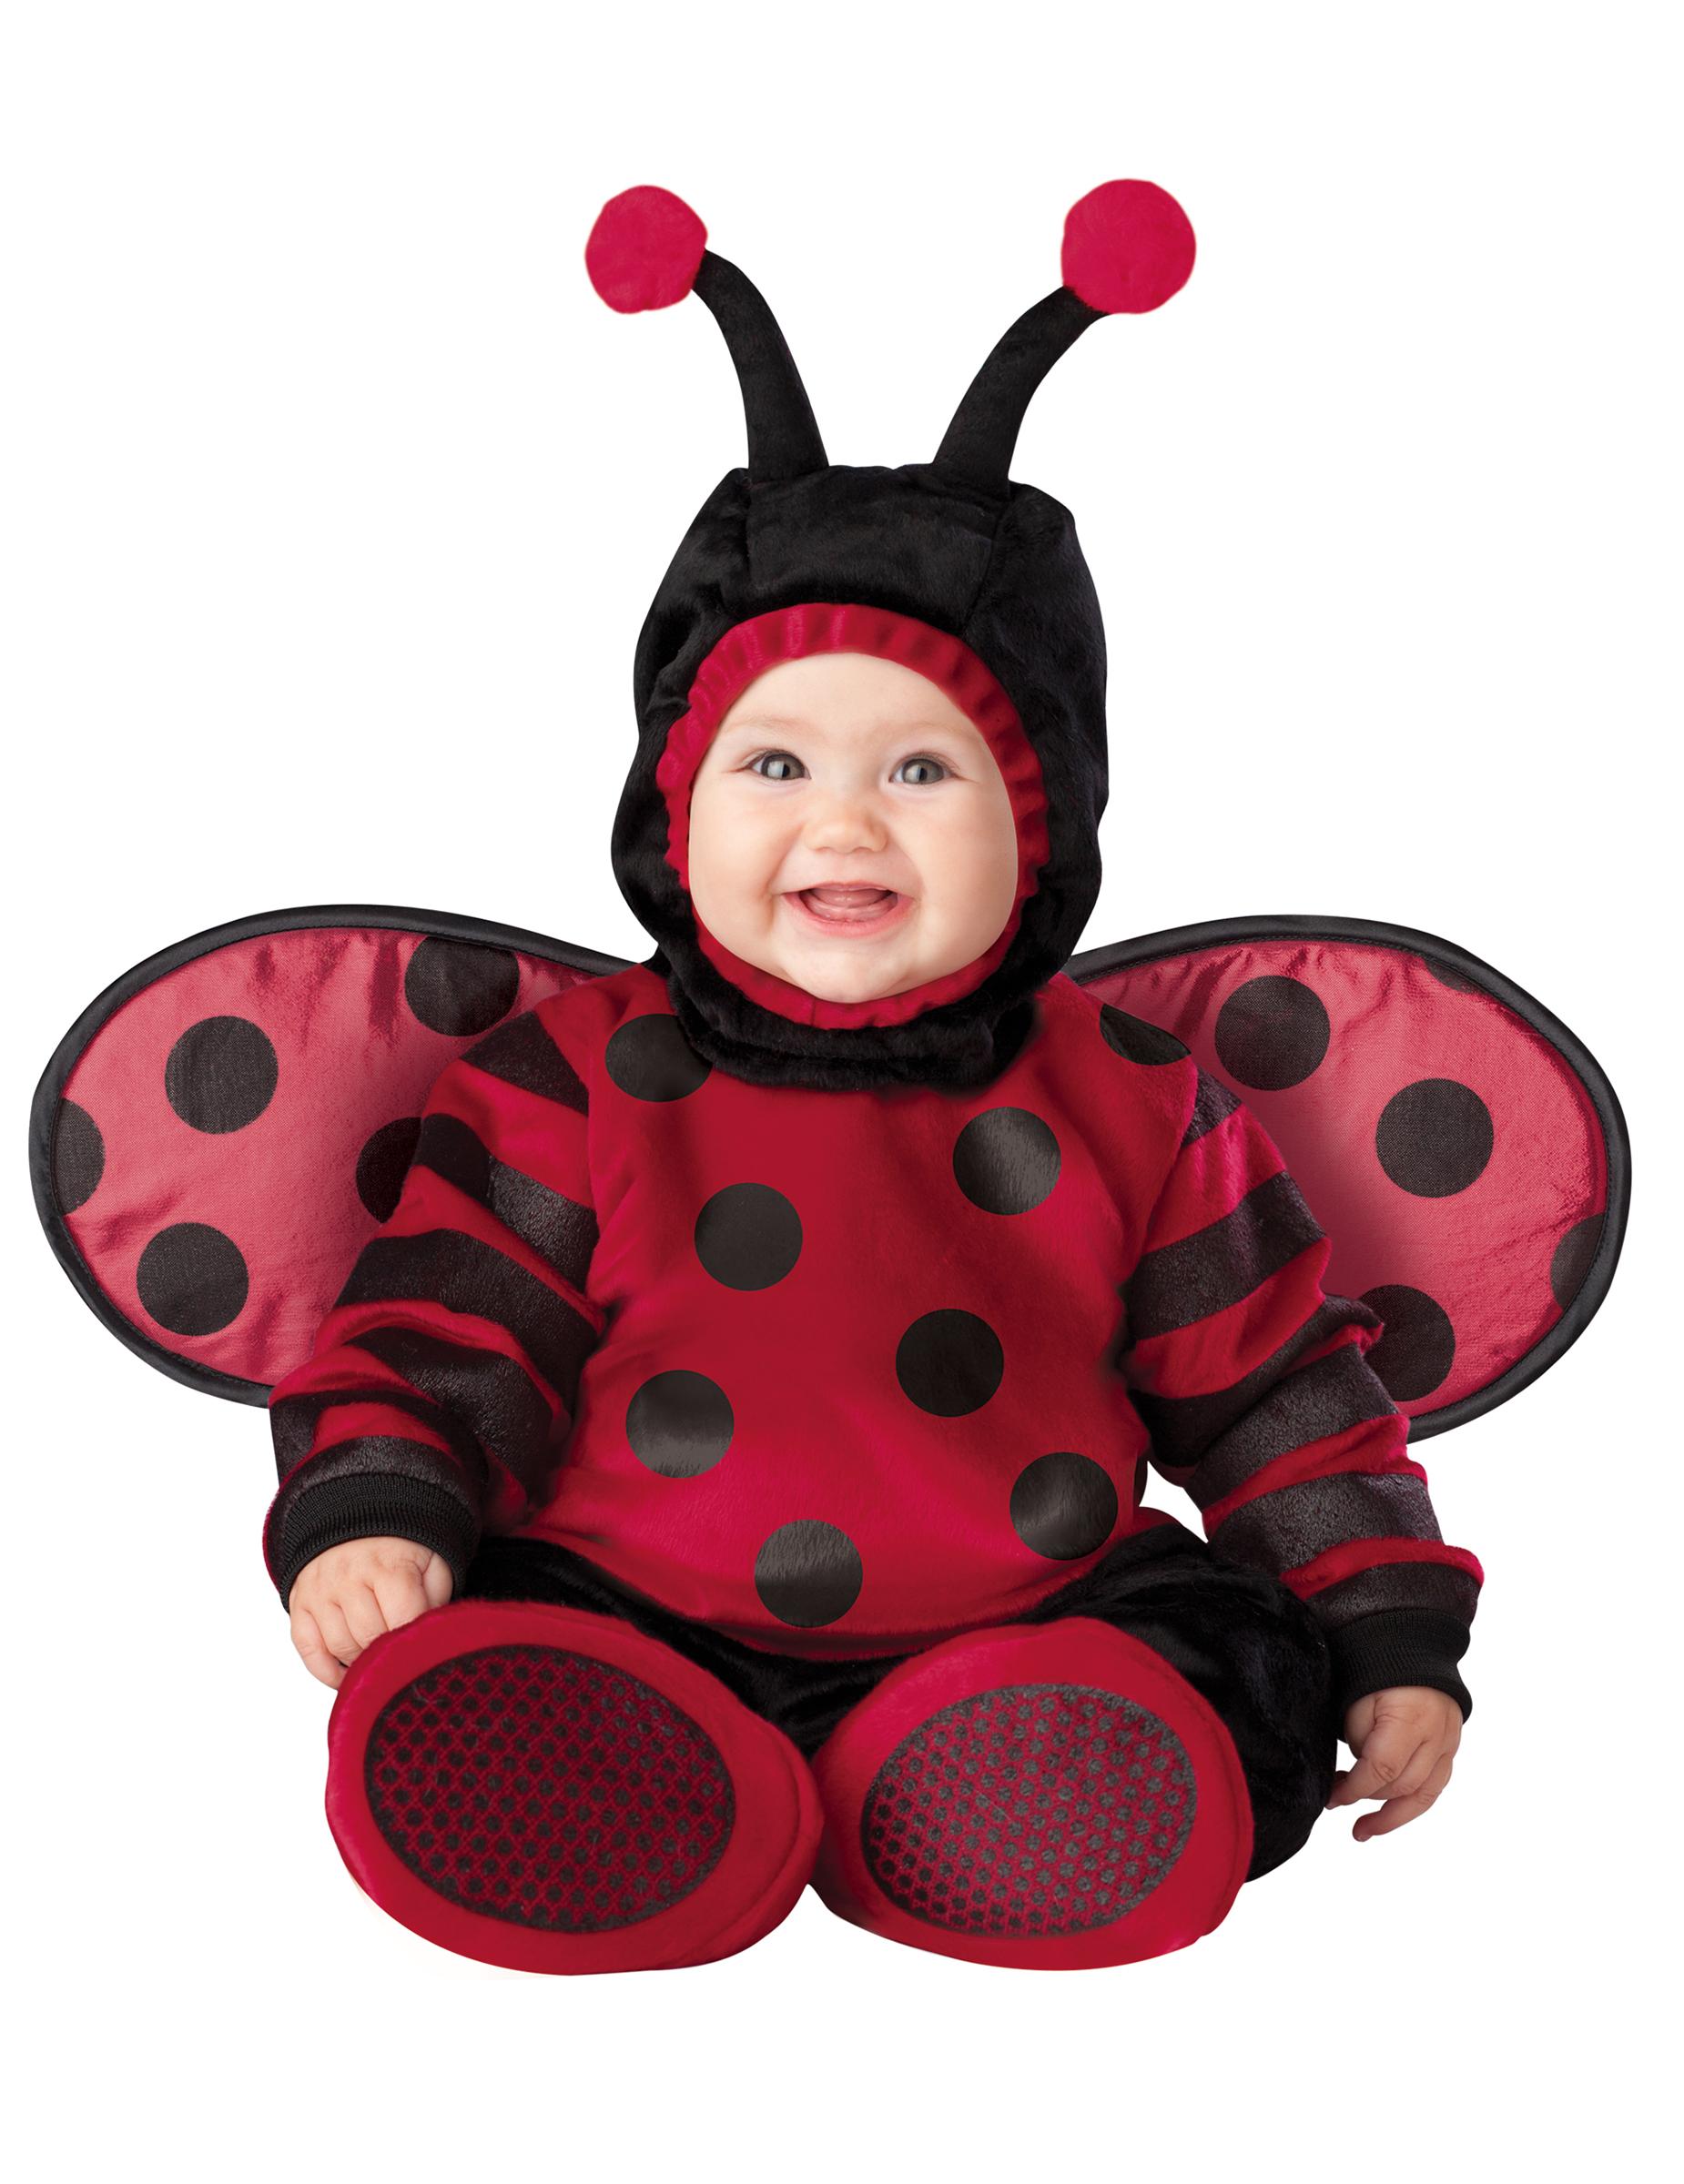 Disfarce Premium de joaninha para bébé  Disfarces Crianças ... 439d0aea89d